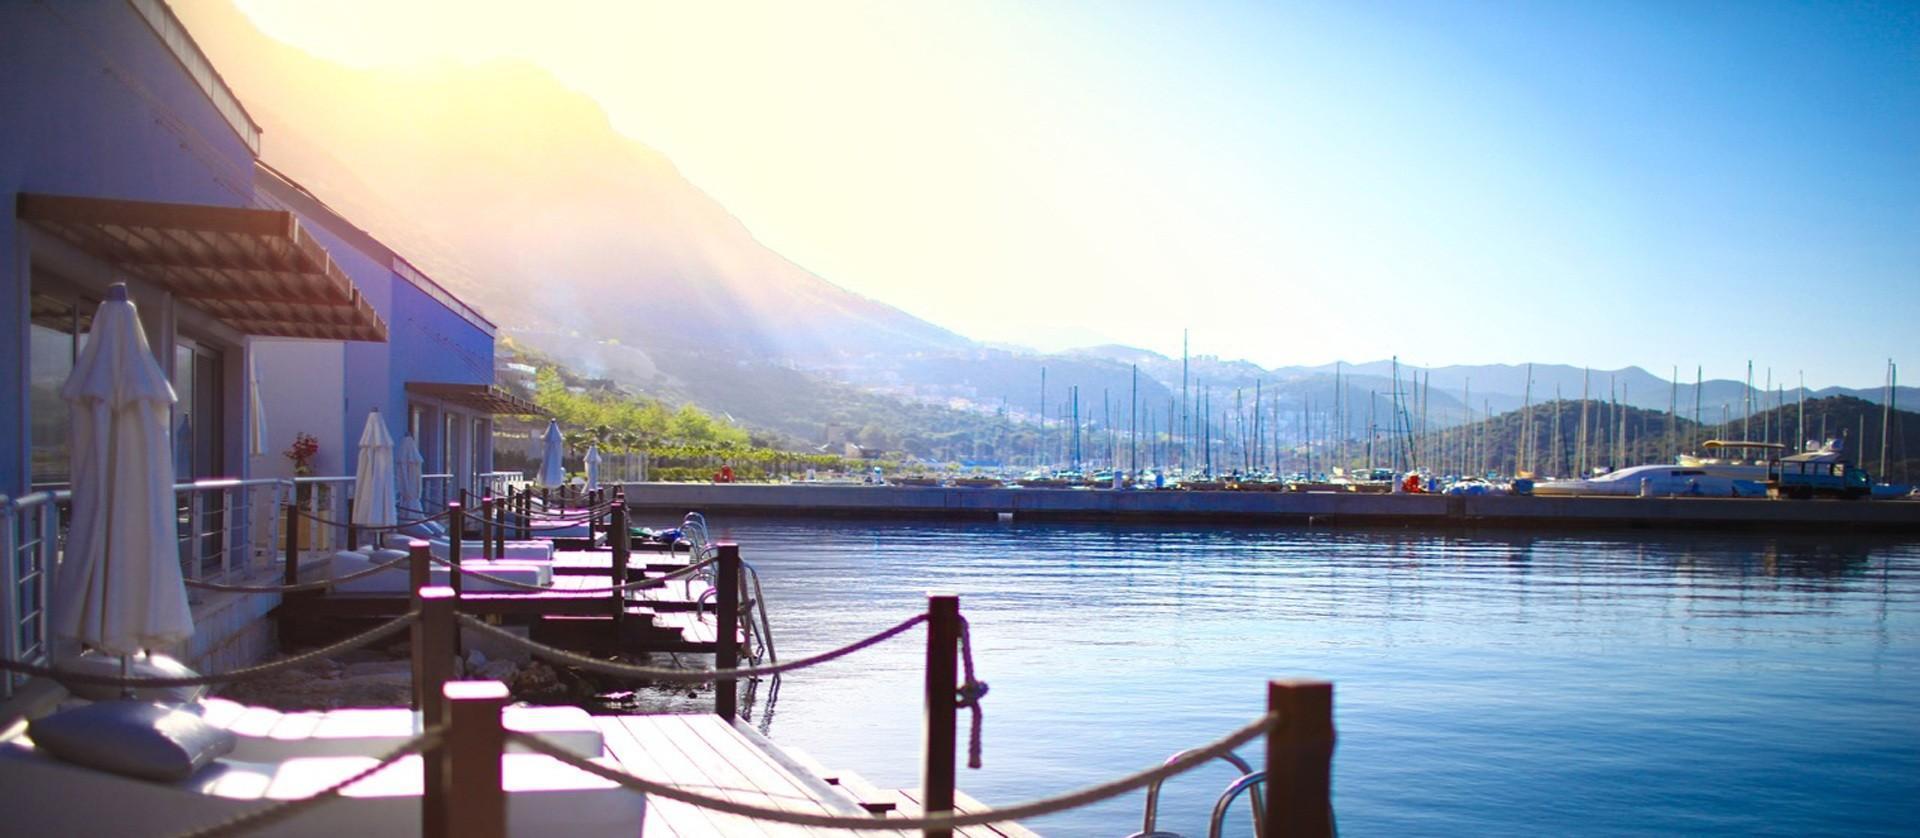 Doria Hotel And Yacht Club